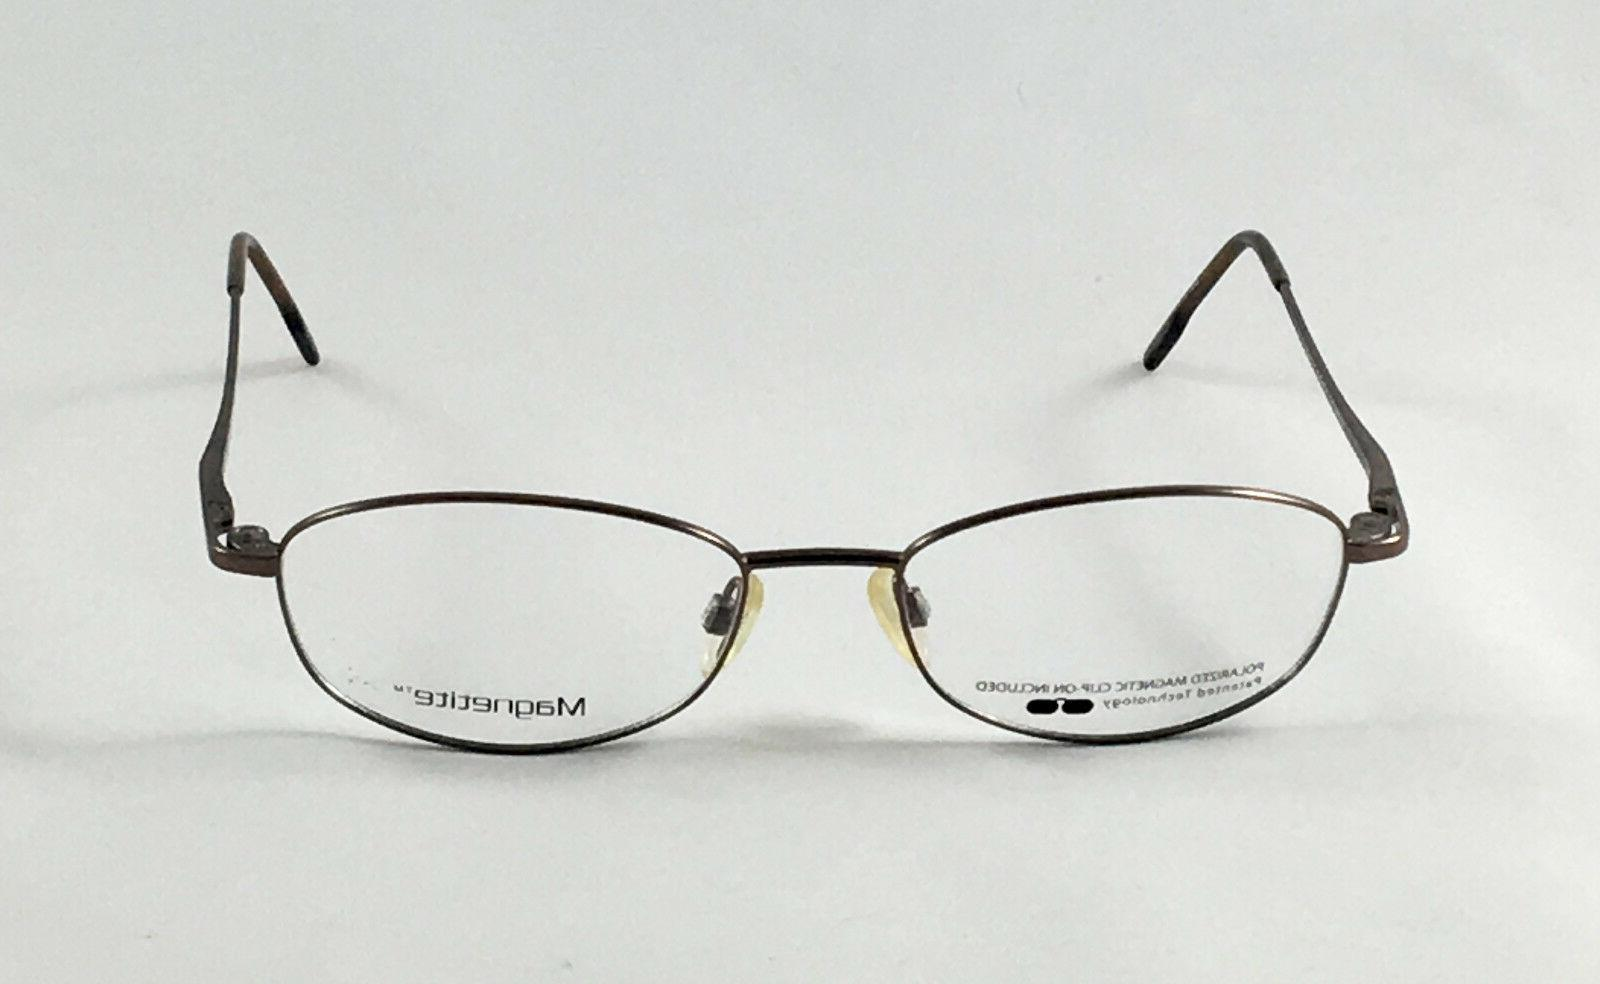 New MG775 10 Men's On Sunglasses 54-18-135